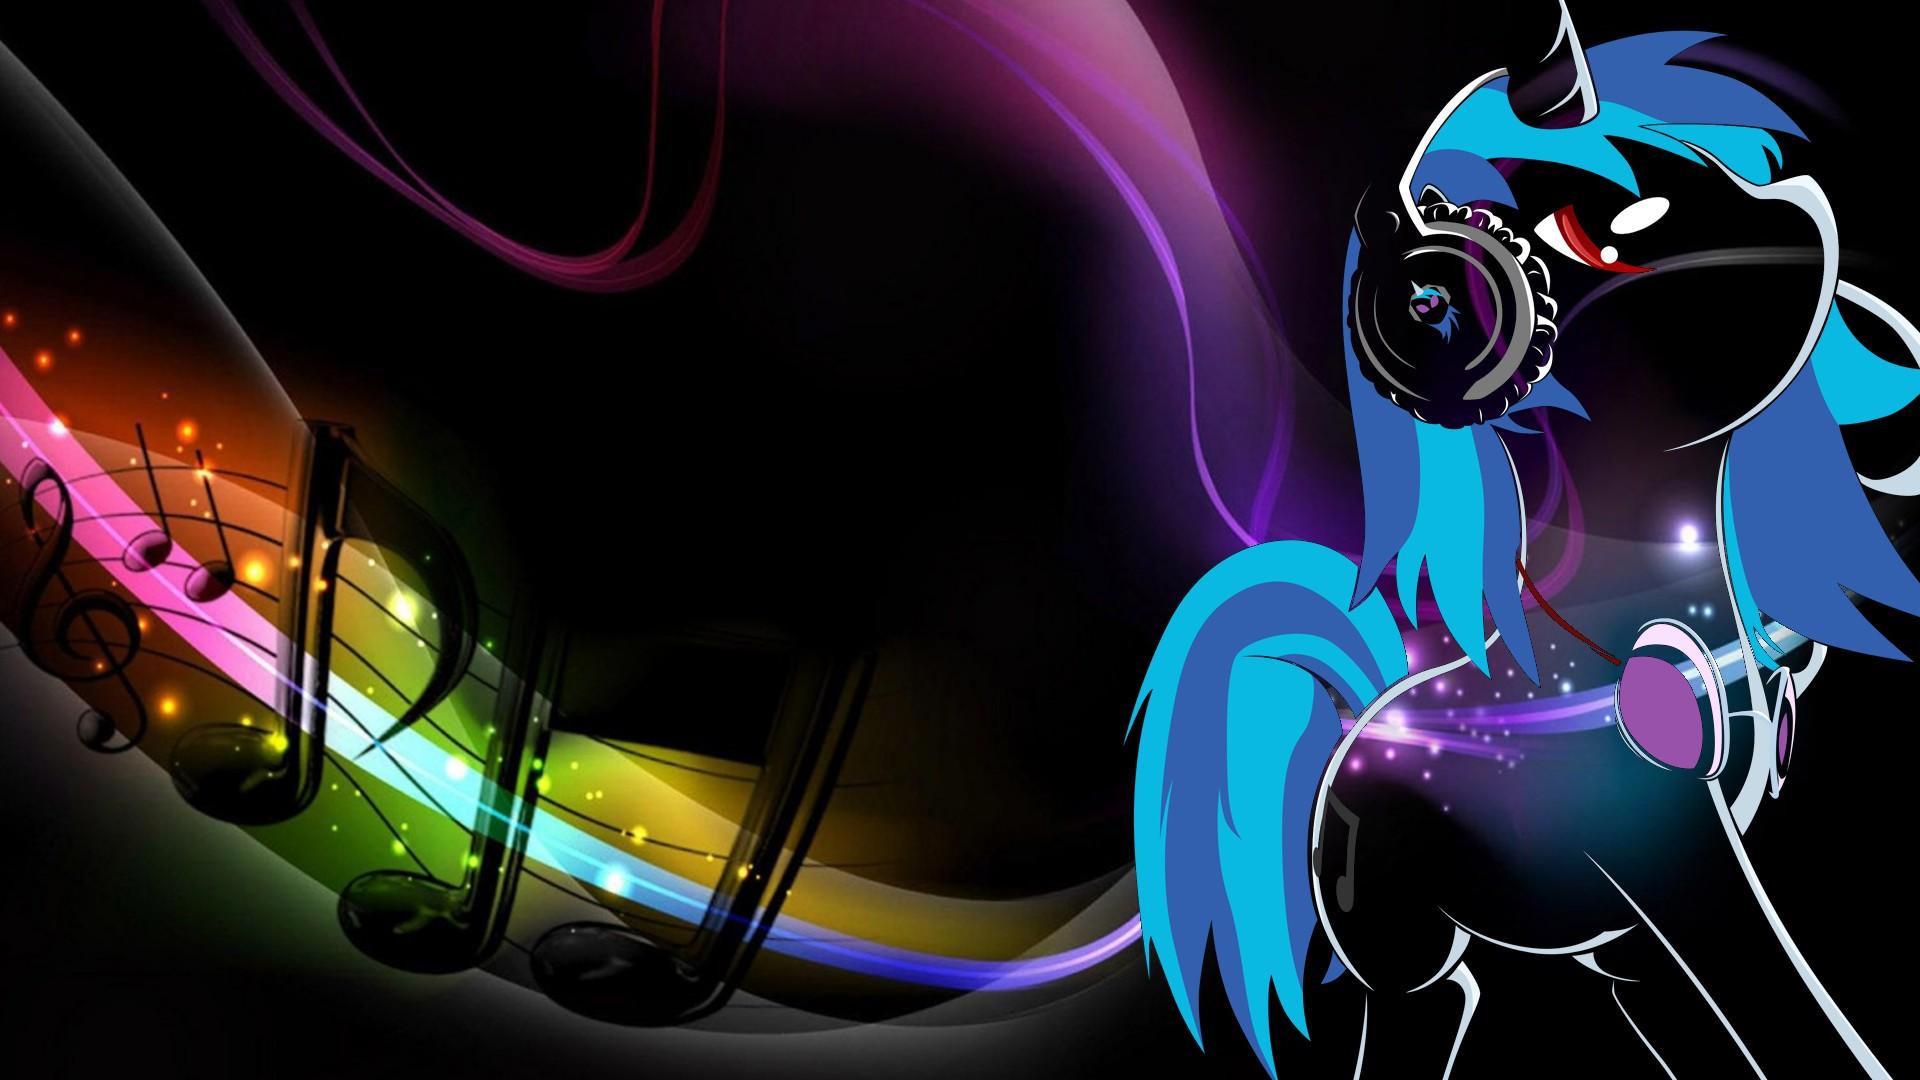 Wallpaper Illustration Anime My Little Pony Dubstep Dj